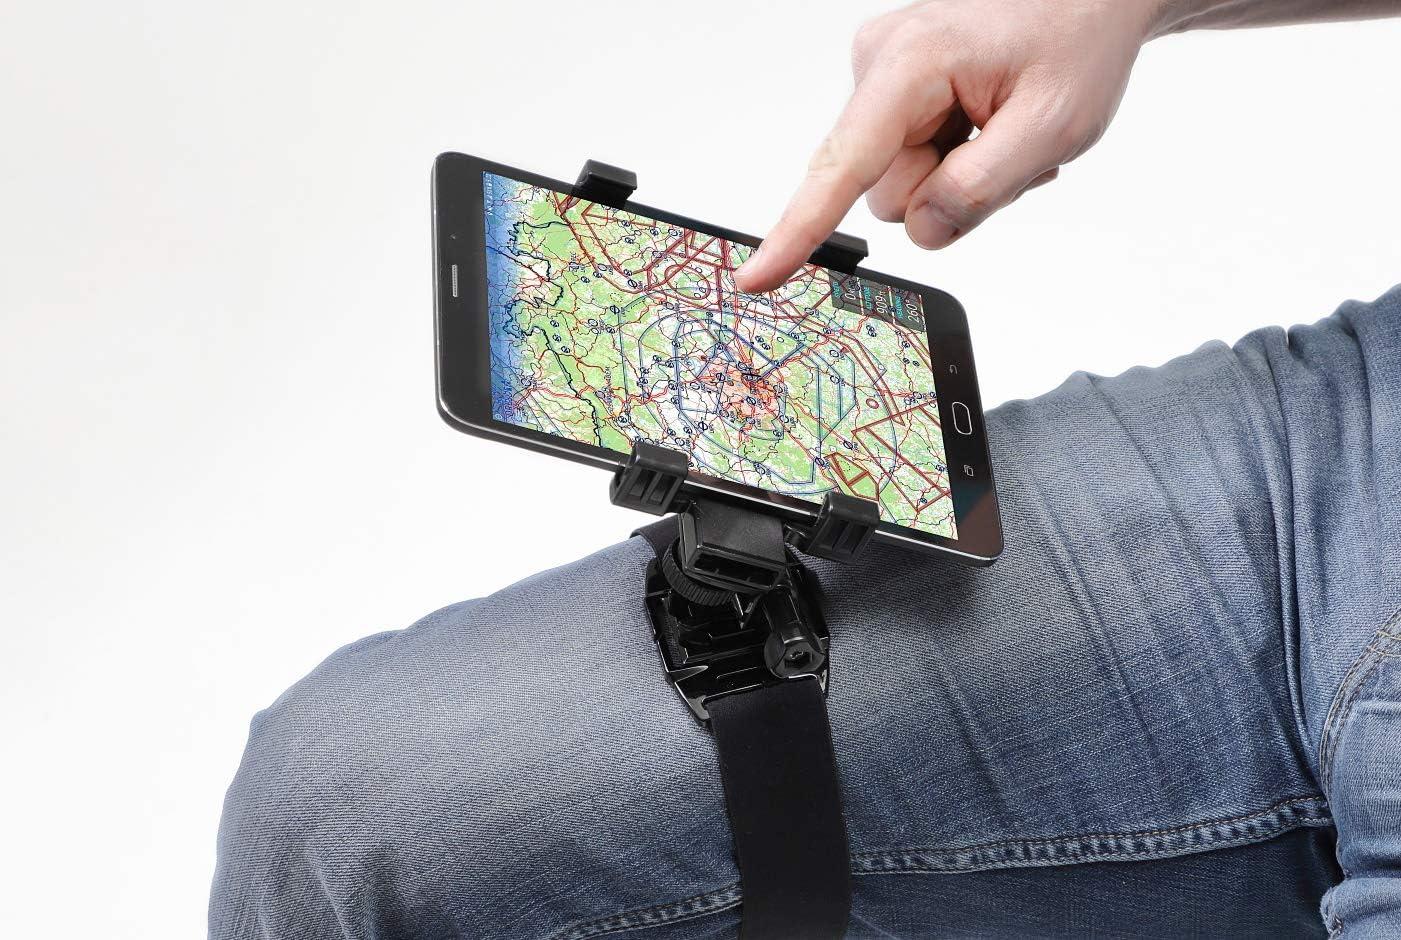 Pilot Kneeboard for Smartphones, Mini Tablets, iPhone, iPad Mini, Android